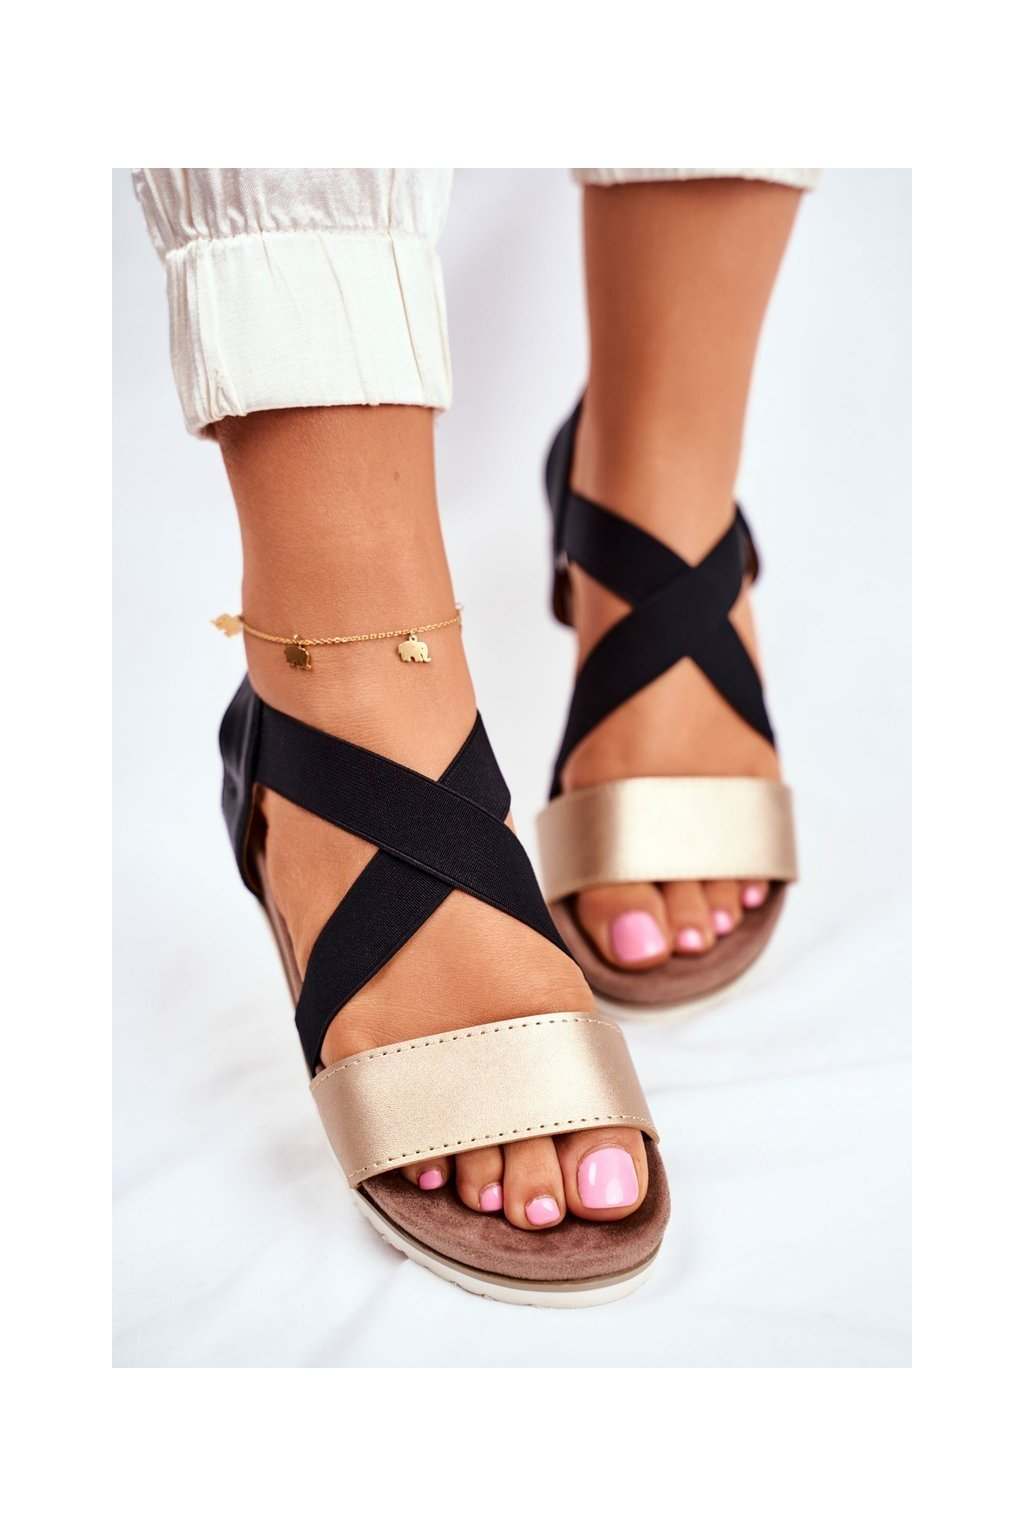 Čierne sandále NJSK 20SD35-0316 BLK GOLD